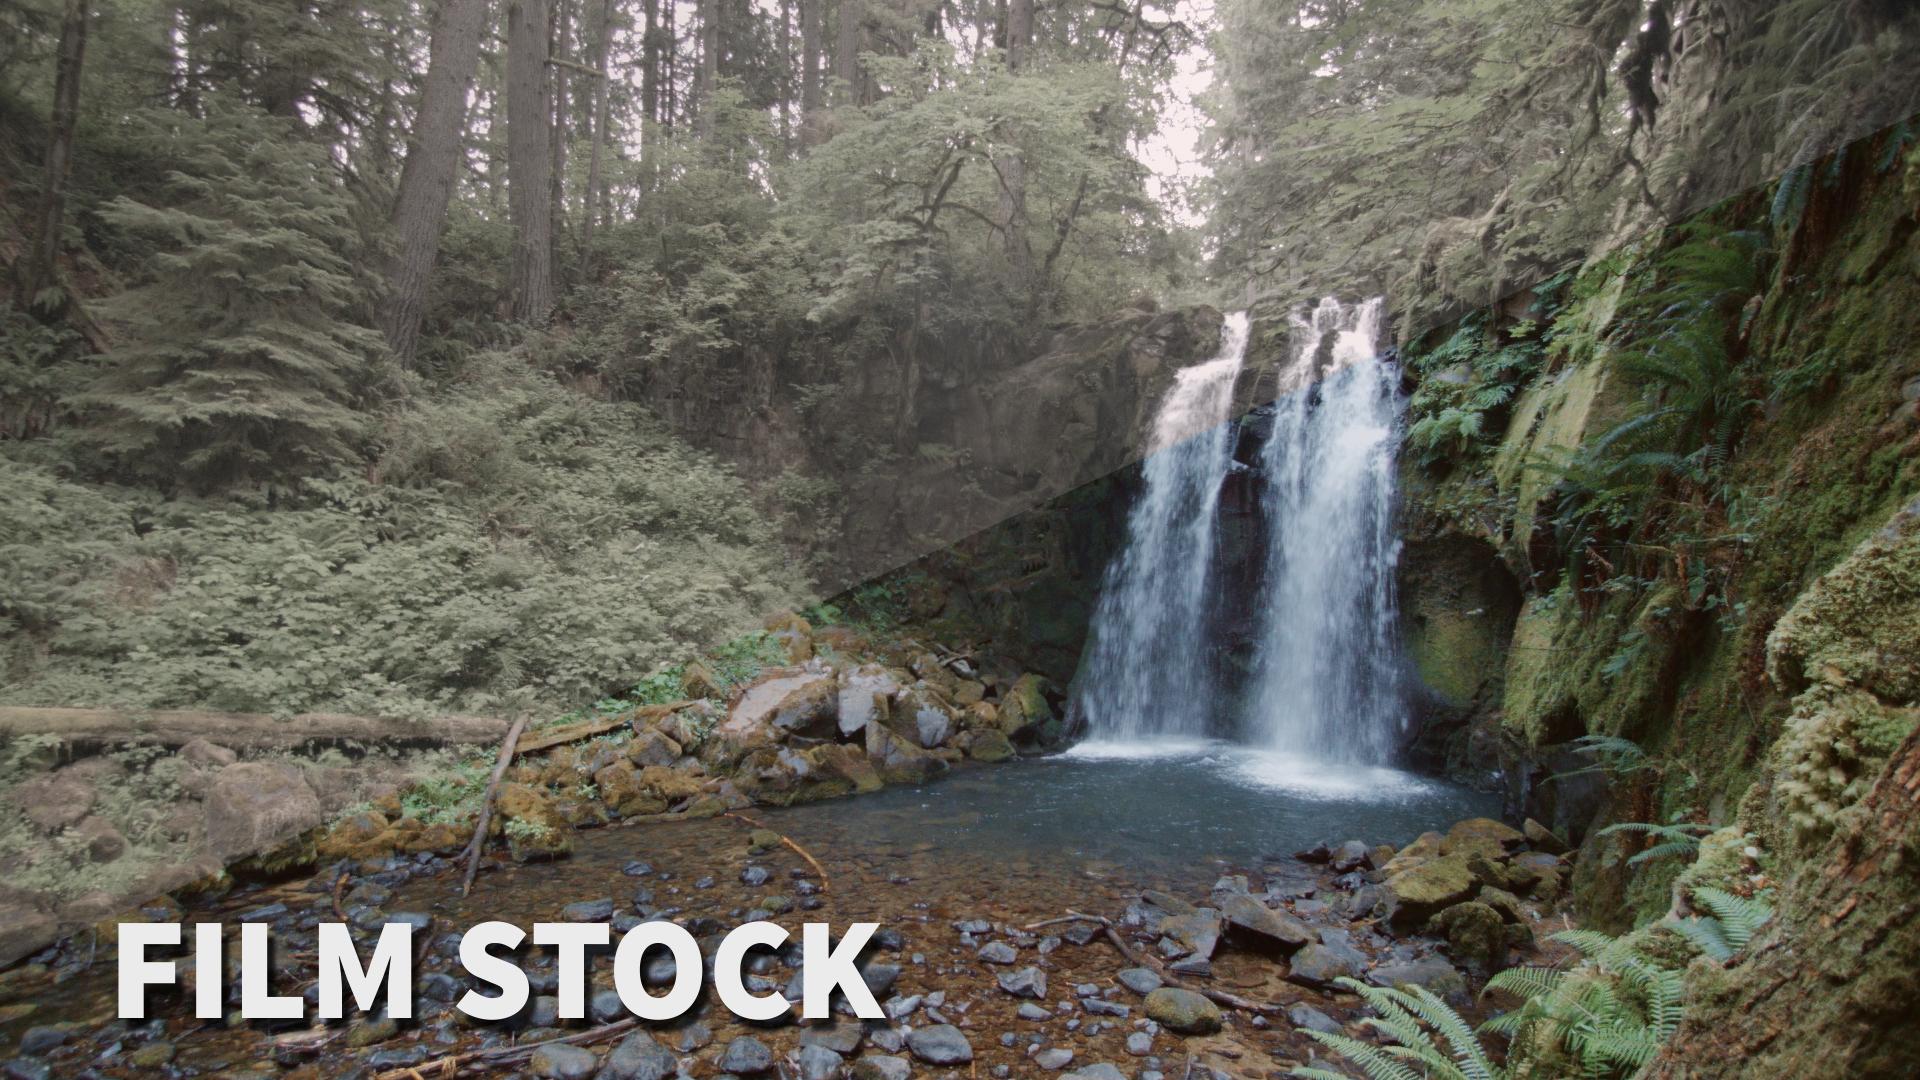 film stock black magic pocket cinema camera luts